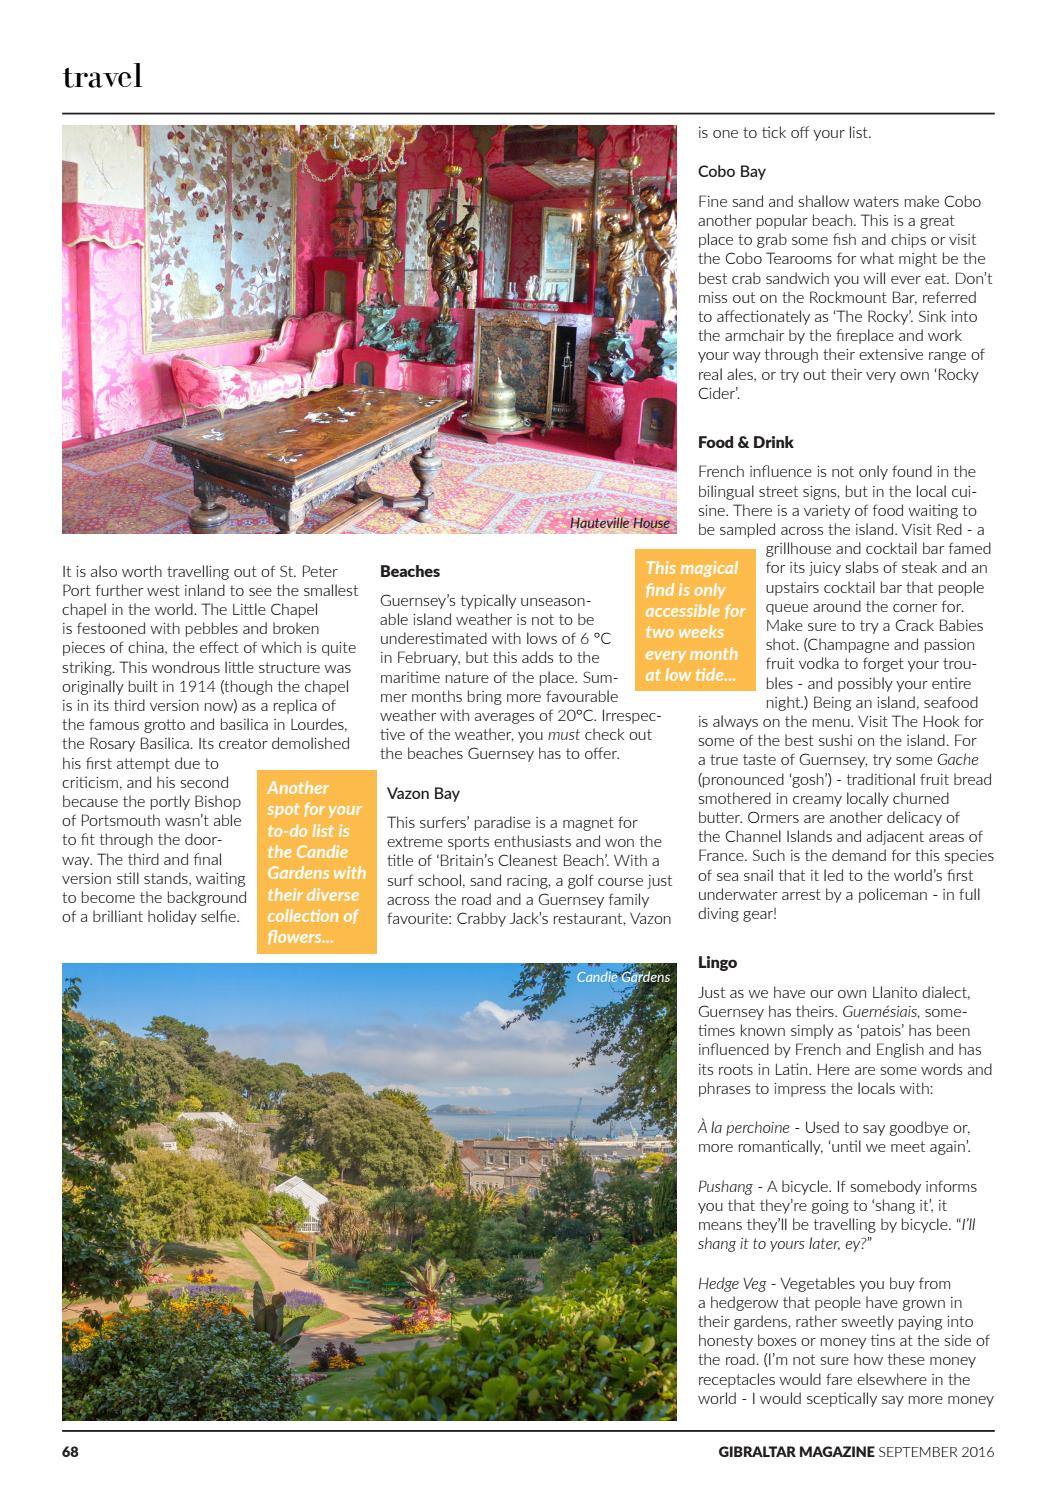 The Gibraltar Magazine September 2016 By Rock Publishing Ltd Issuu